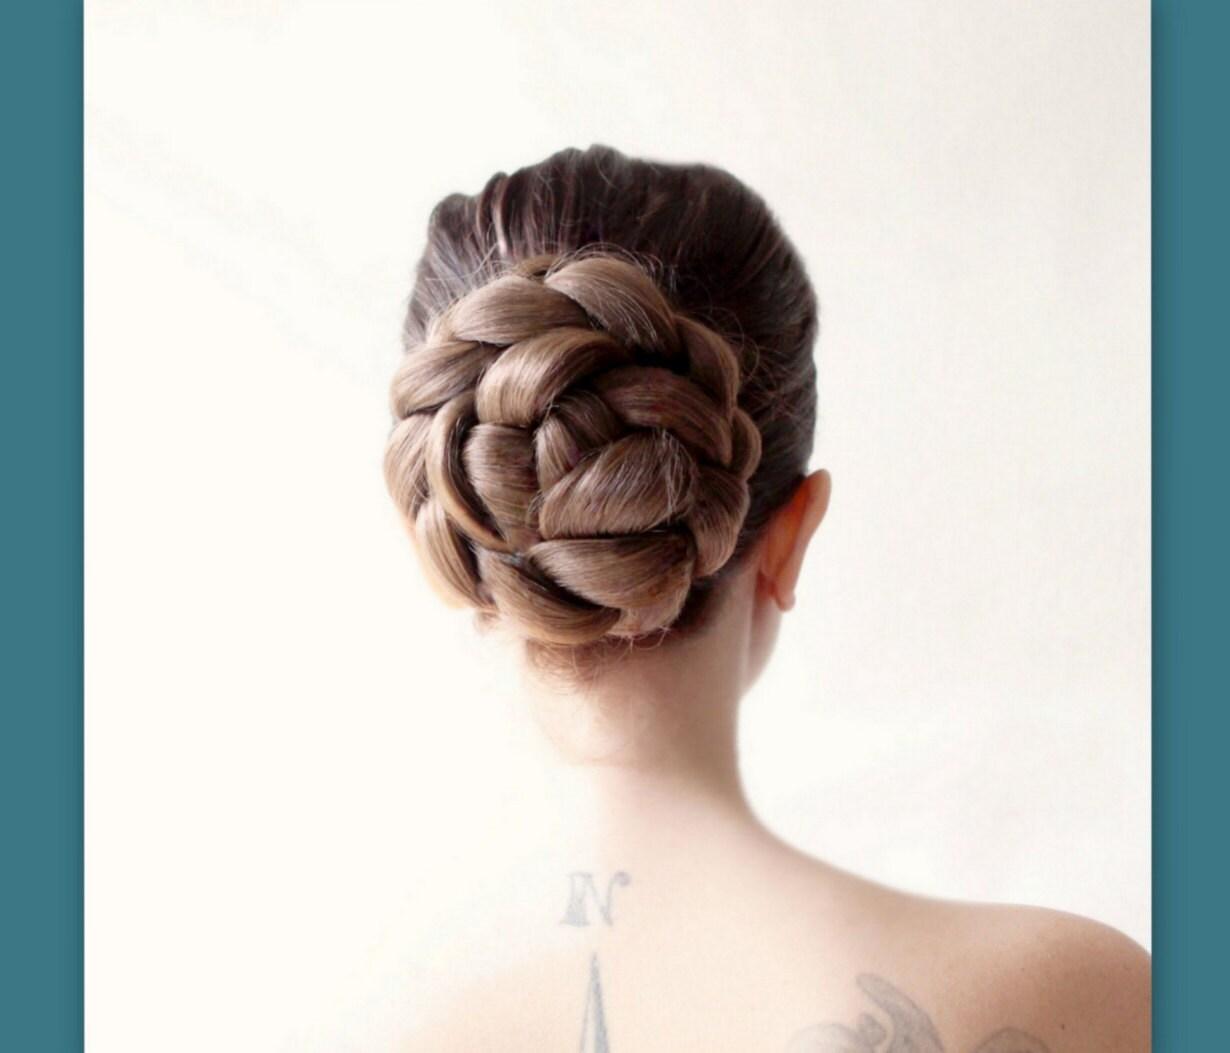 bridal hair wedding hairpiece ballet bun cover hair style